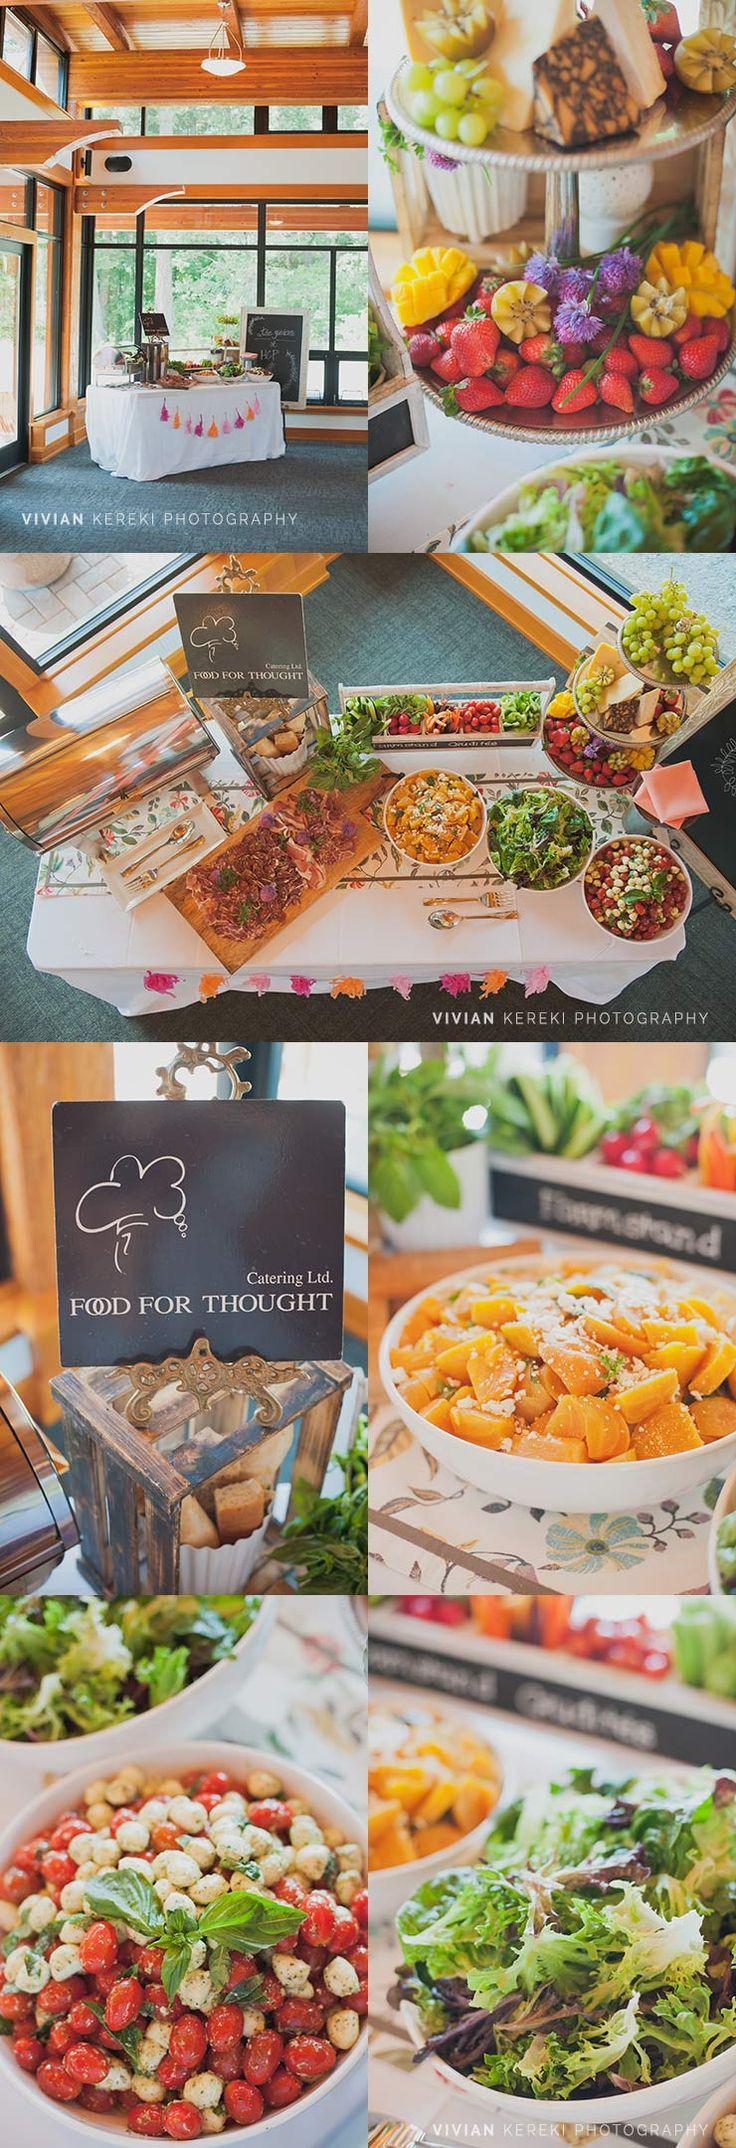 HCP wedding catering crudités